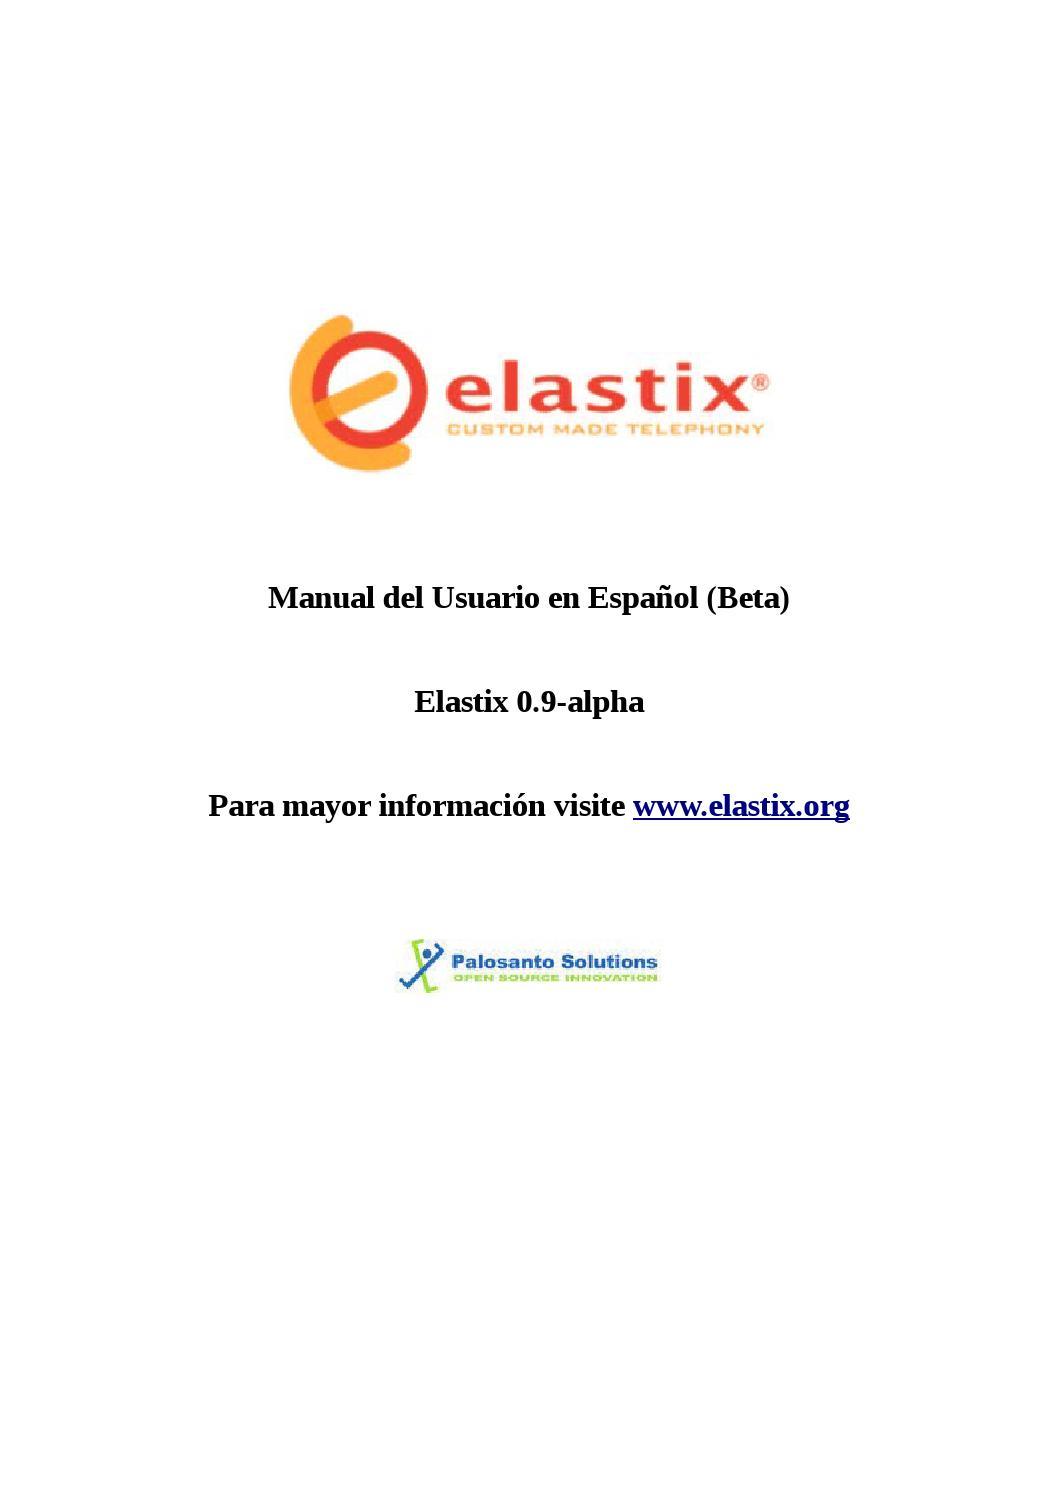 1 simmrate sistema de tarificación para elastix manual del.